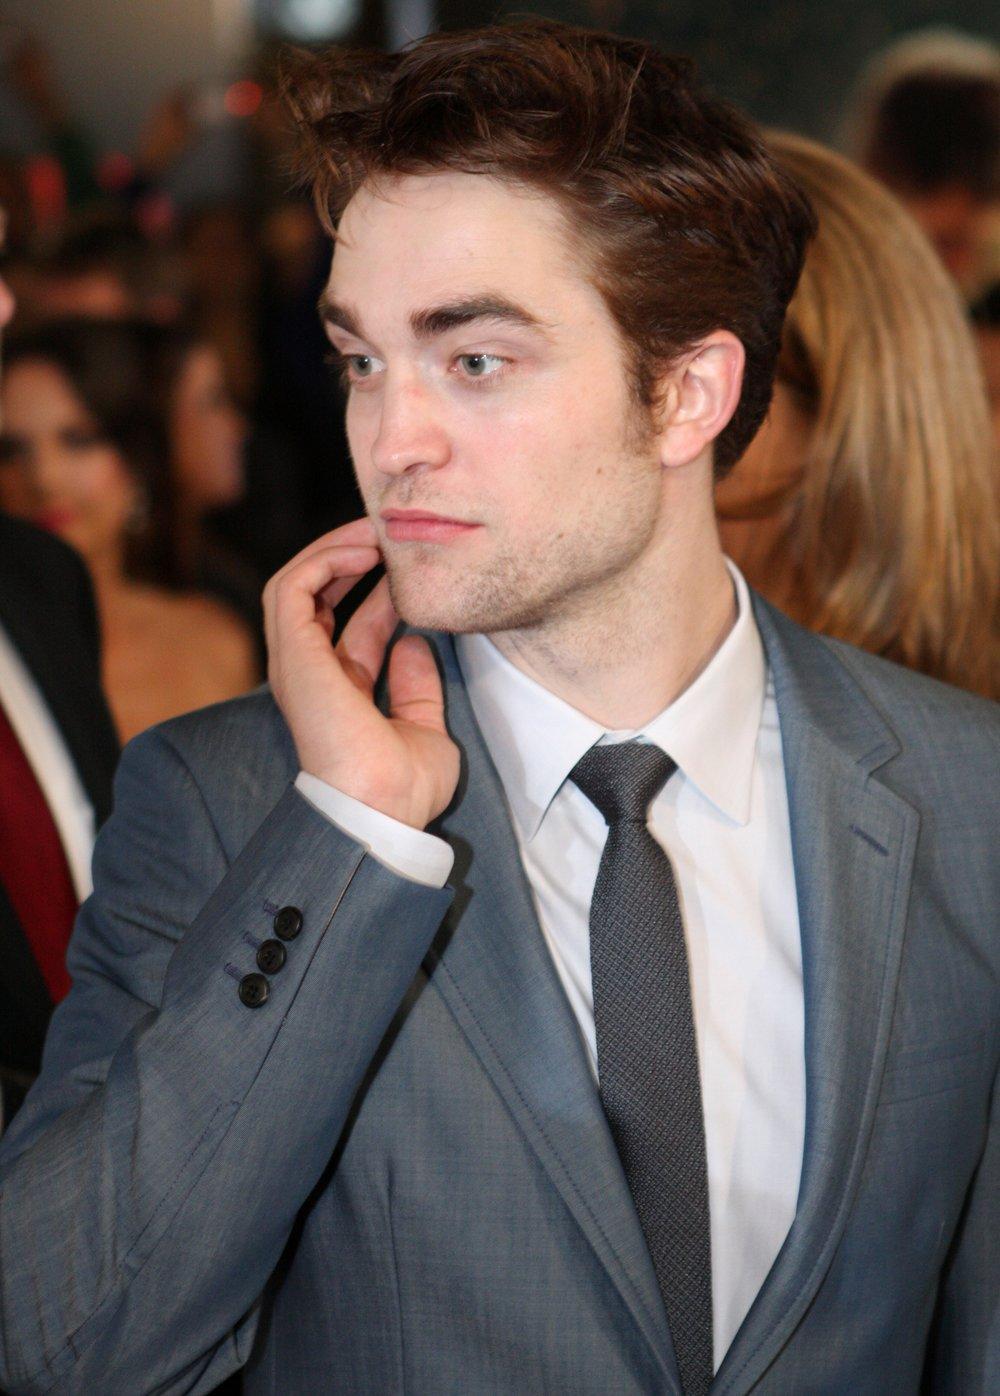 https://commons.wikimedia.org/wiki/File:Robert_Pattinson_02.jpg